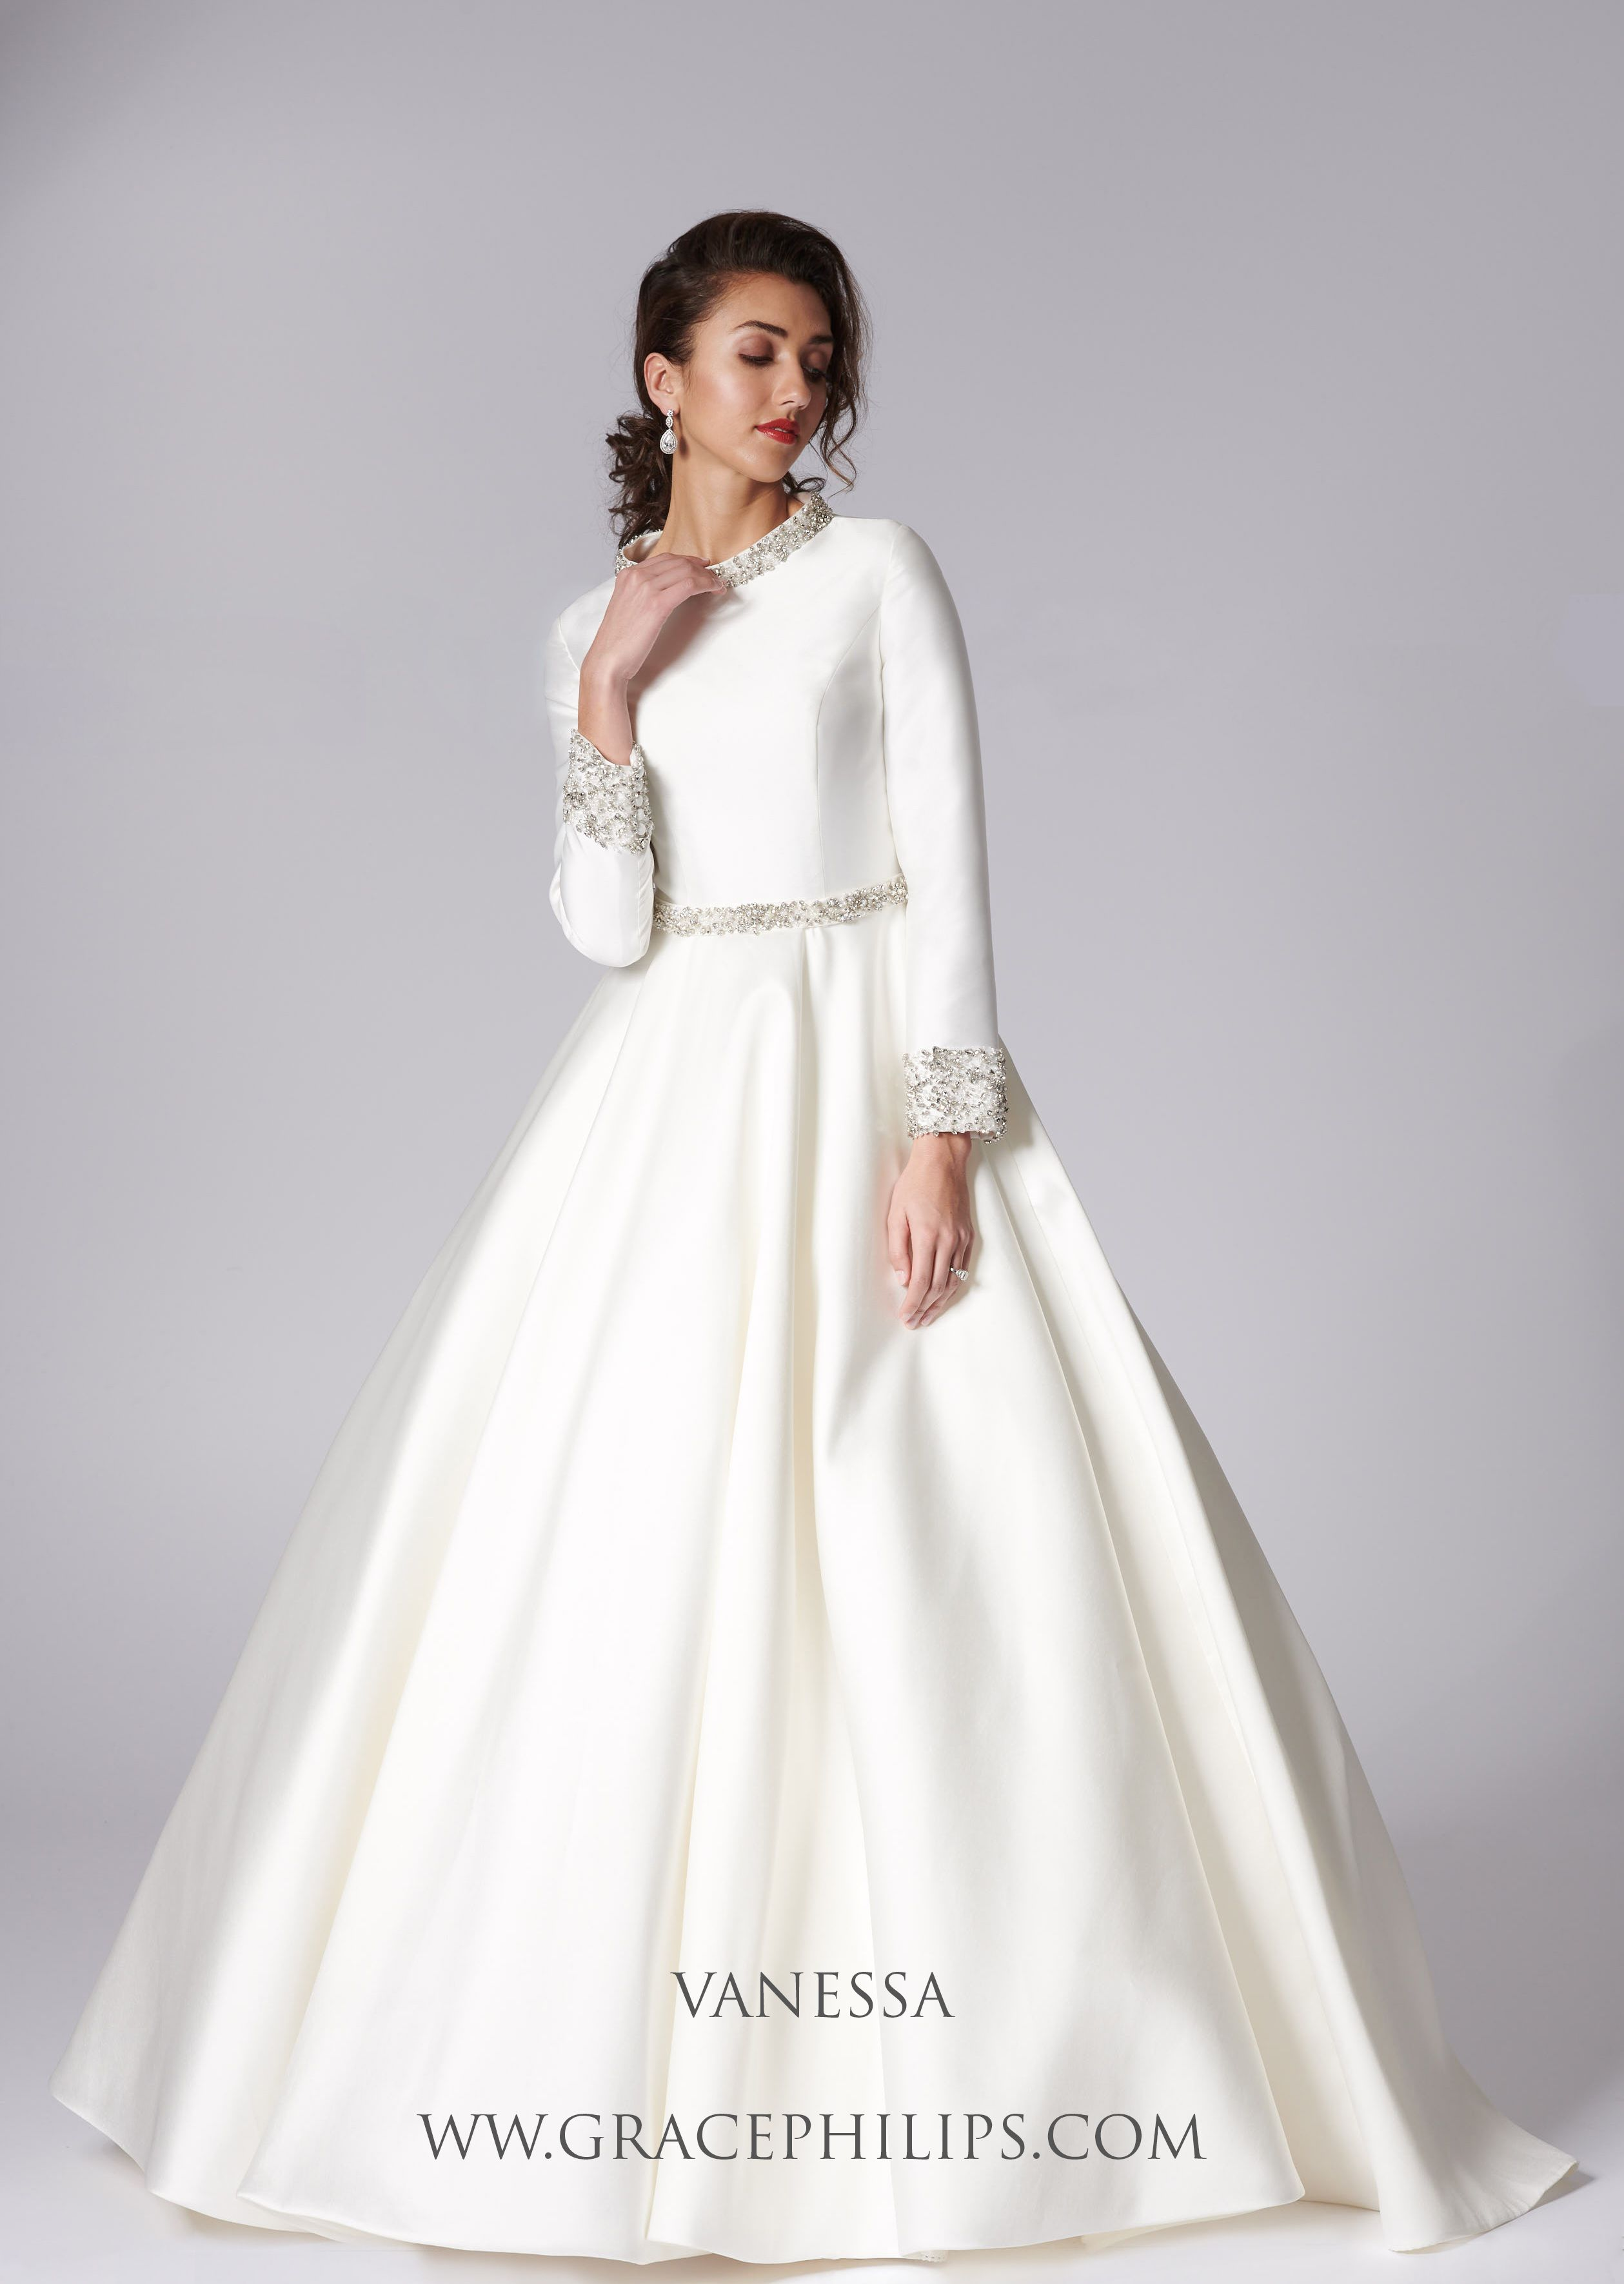 Modest Elegant And Modern Vanessa Is An Ivory Mikado Wedding Dress With Diamante Detail Modest Wedding Dresses Ball Gown Wedding Dress Wedding Dresses Simple [ 3541 x 2518 Pixel ]